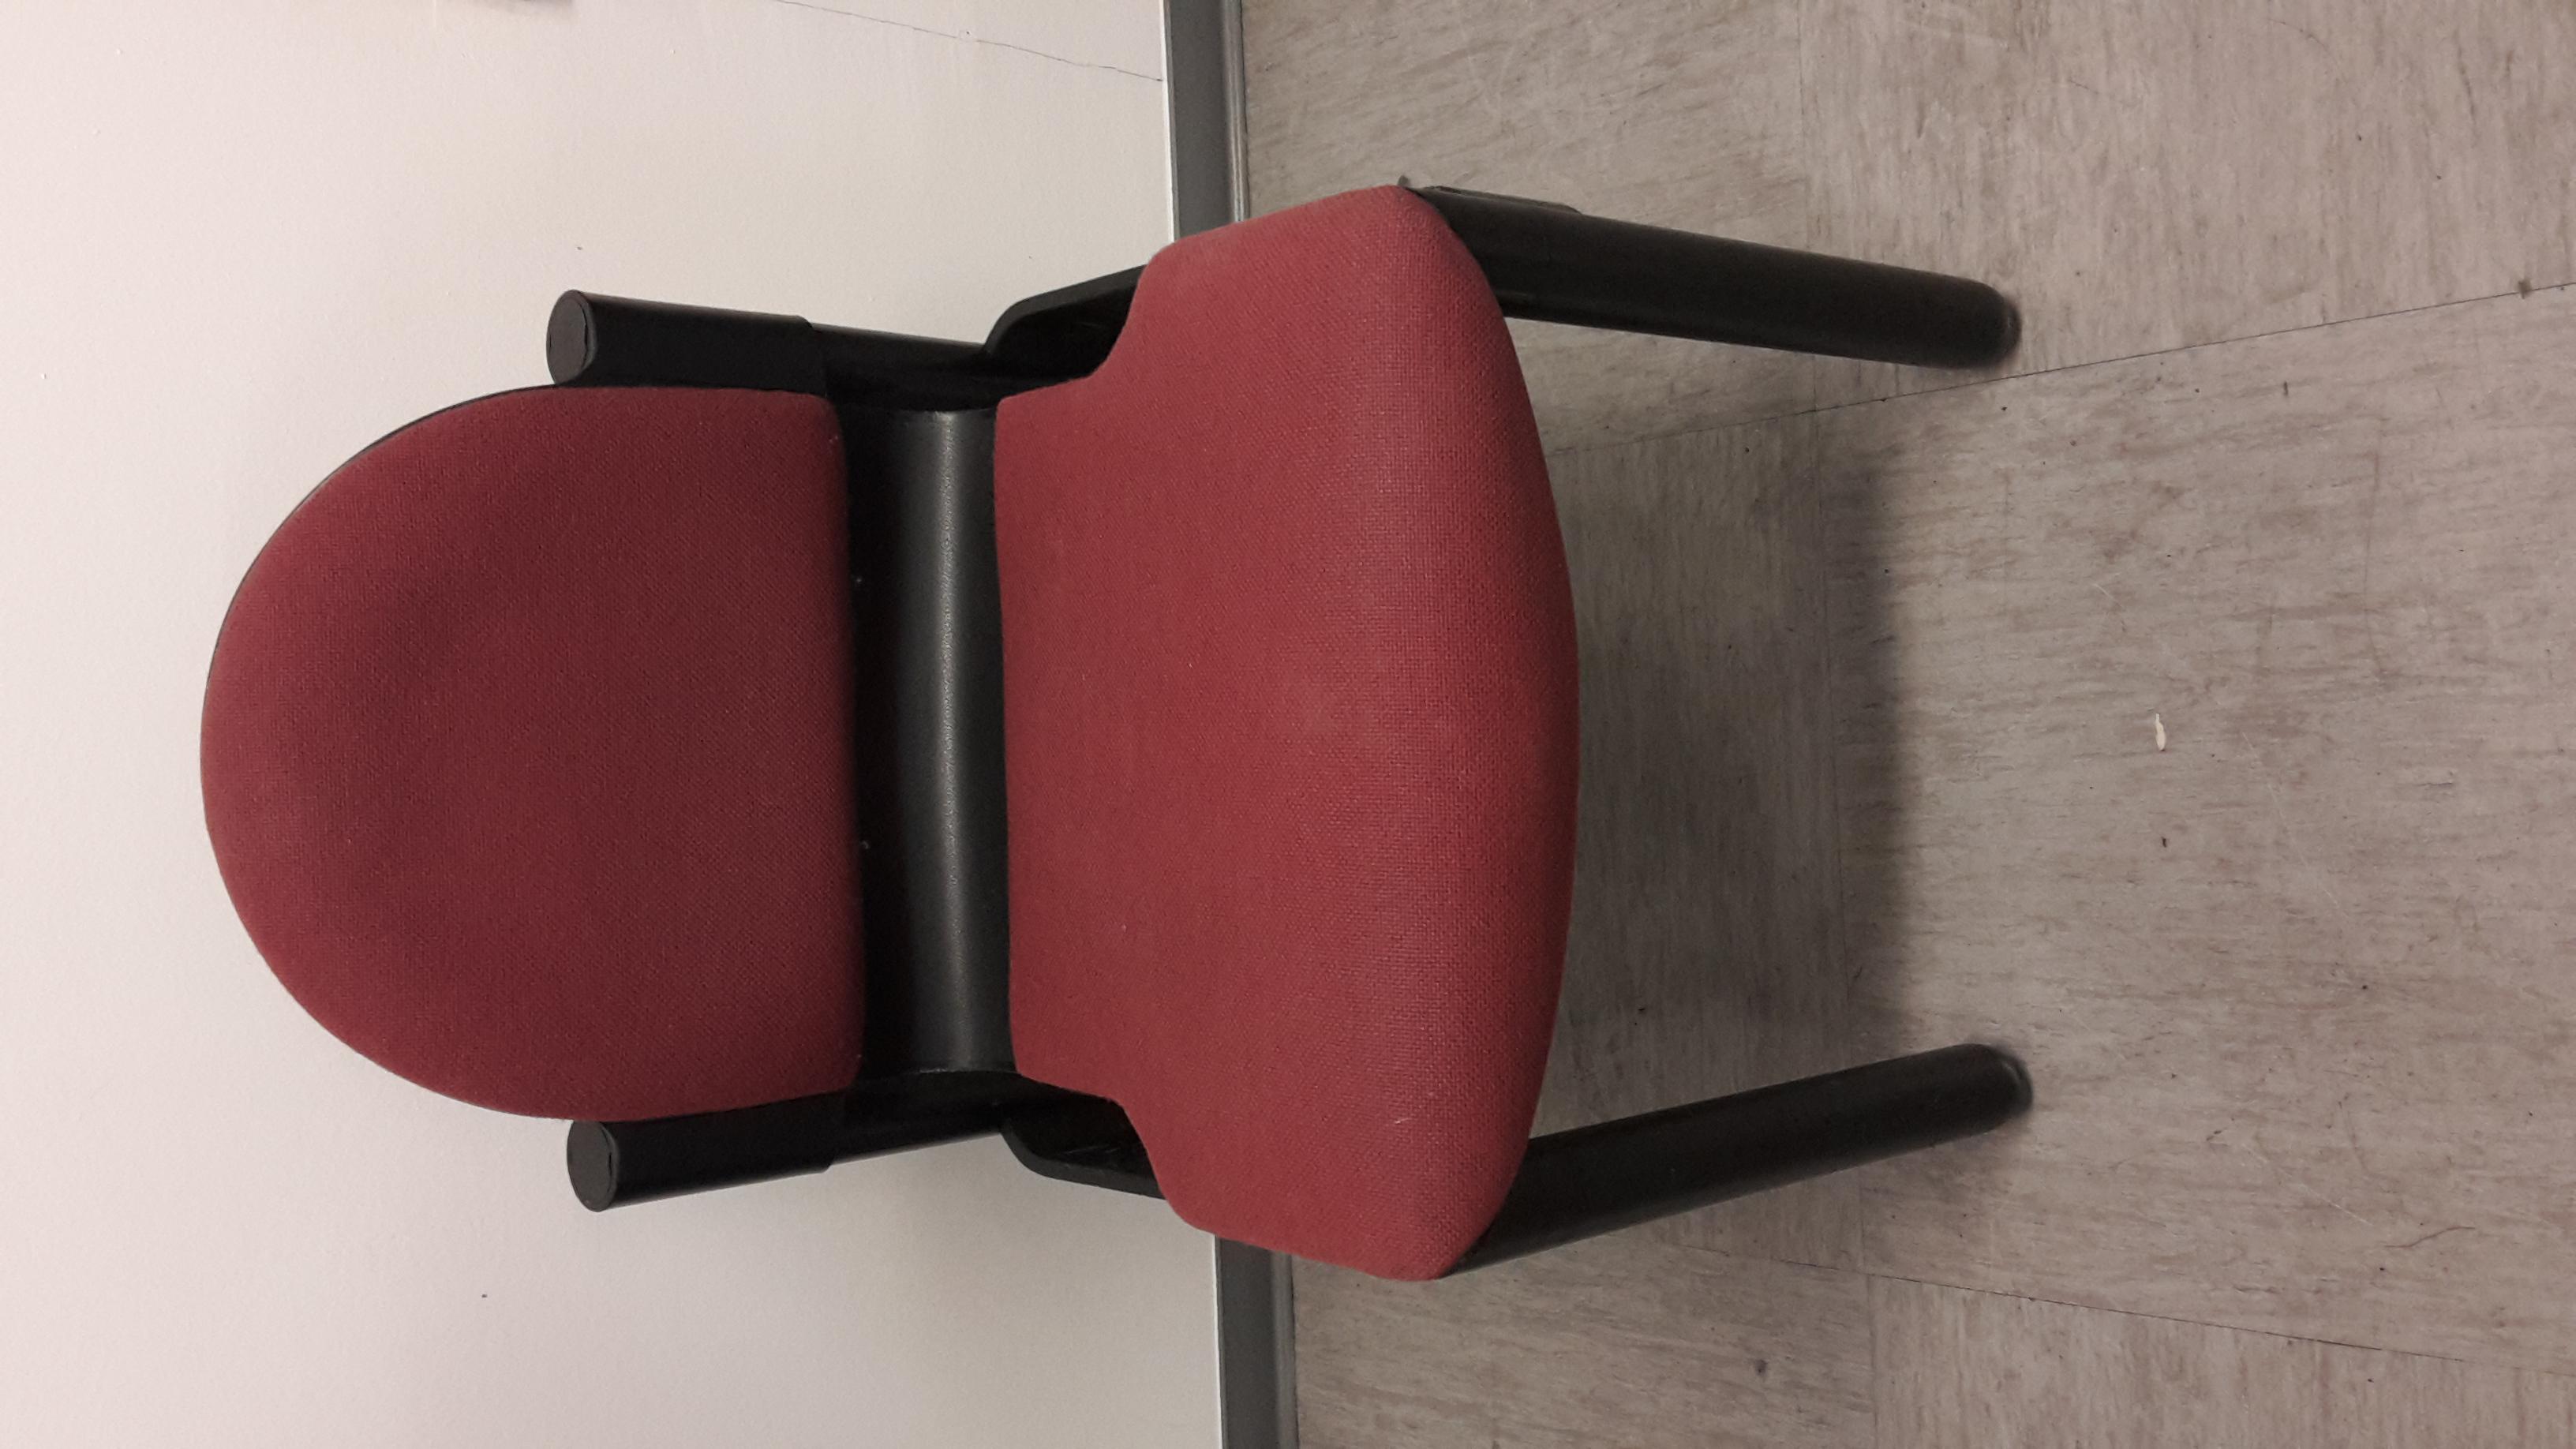 thonet bistro stapelstuhl flex mit polster p1142. Black Bedroom Furniture Sets. Home Design Ideas